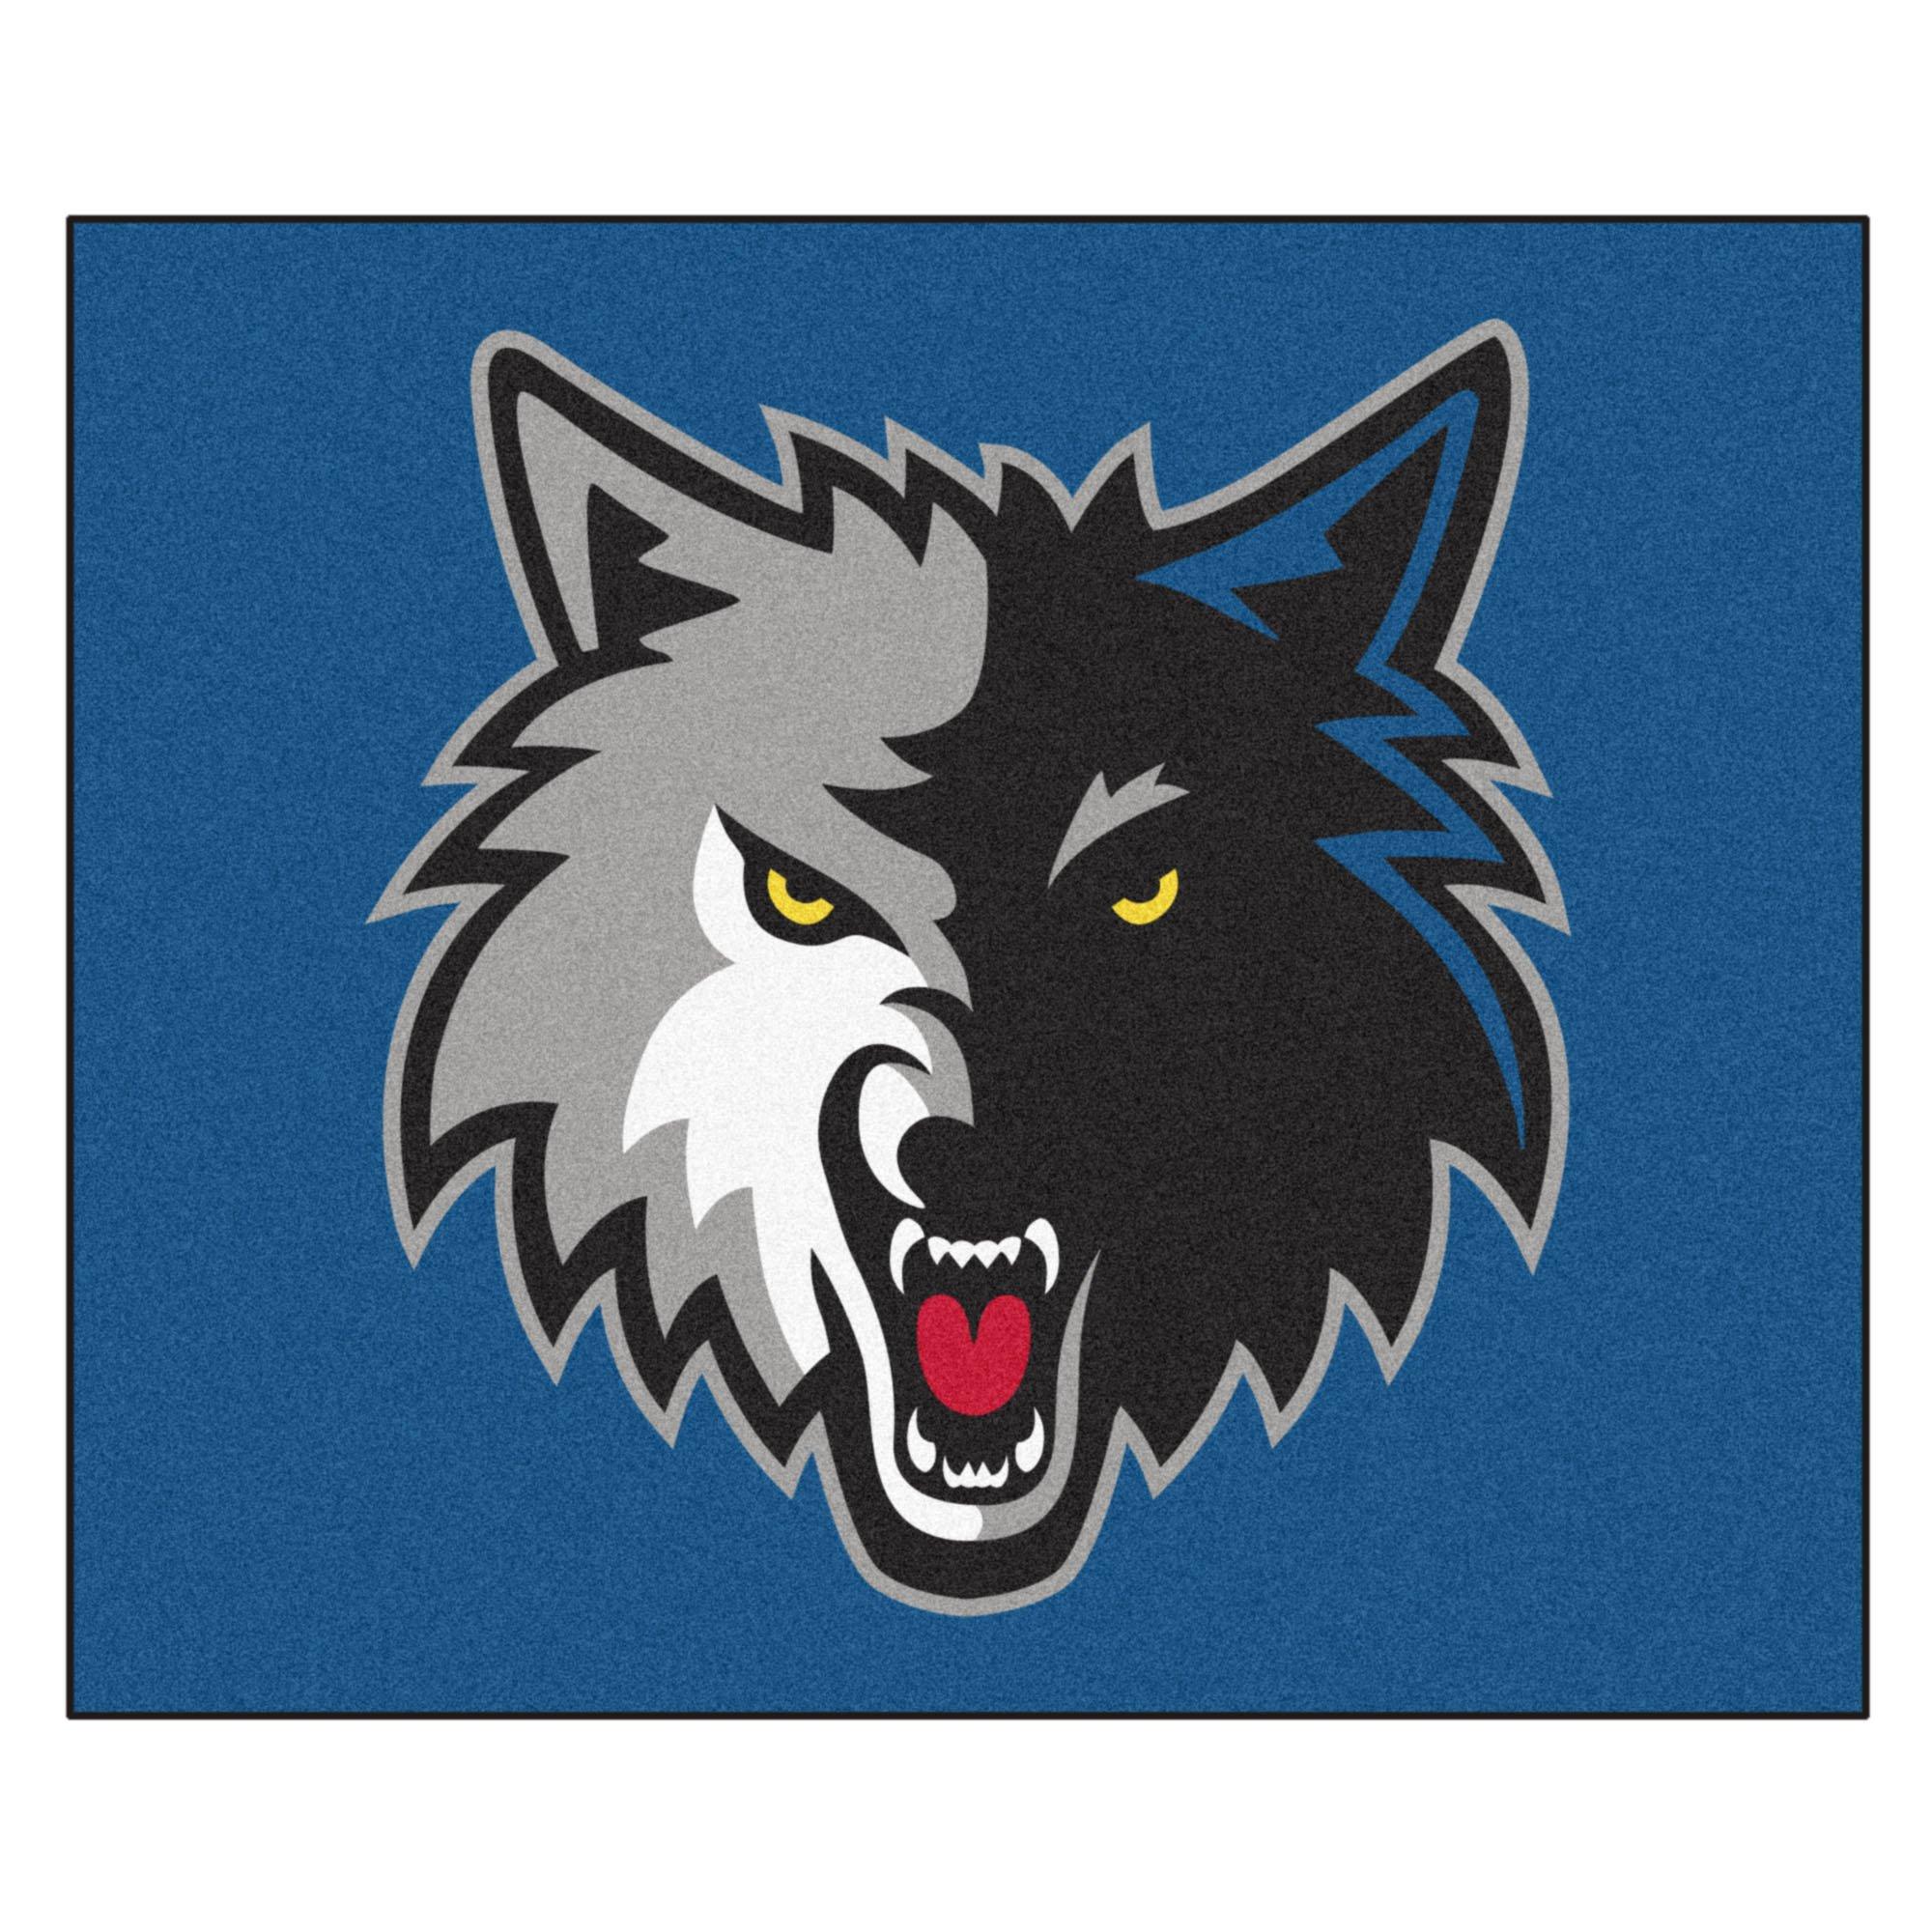 FANMATS 19456 NBA - Minnesota Timberwolves Tailgater Rug , Team Color, 59.5''x71''